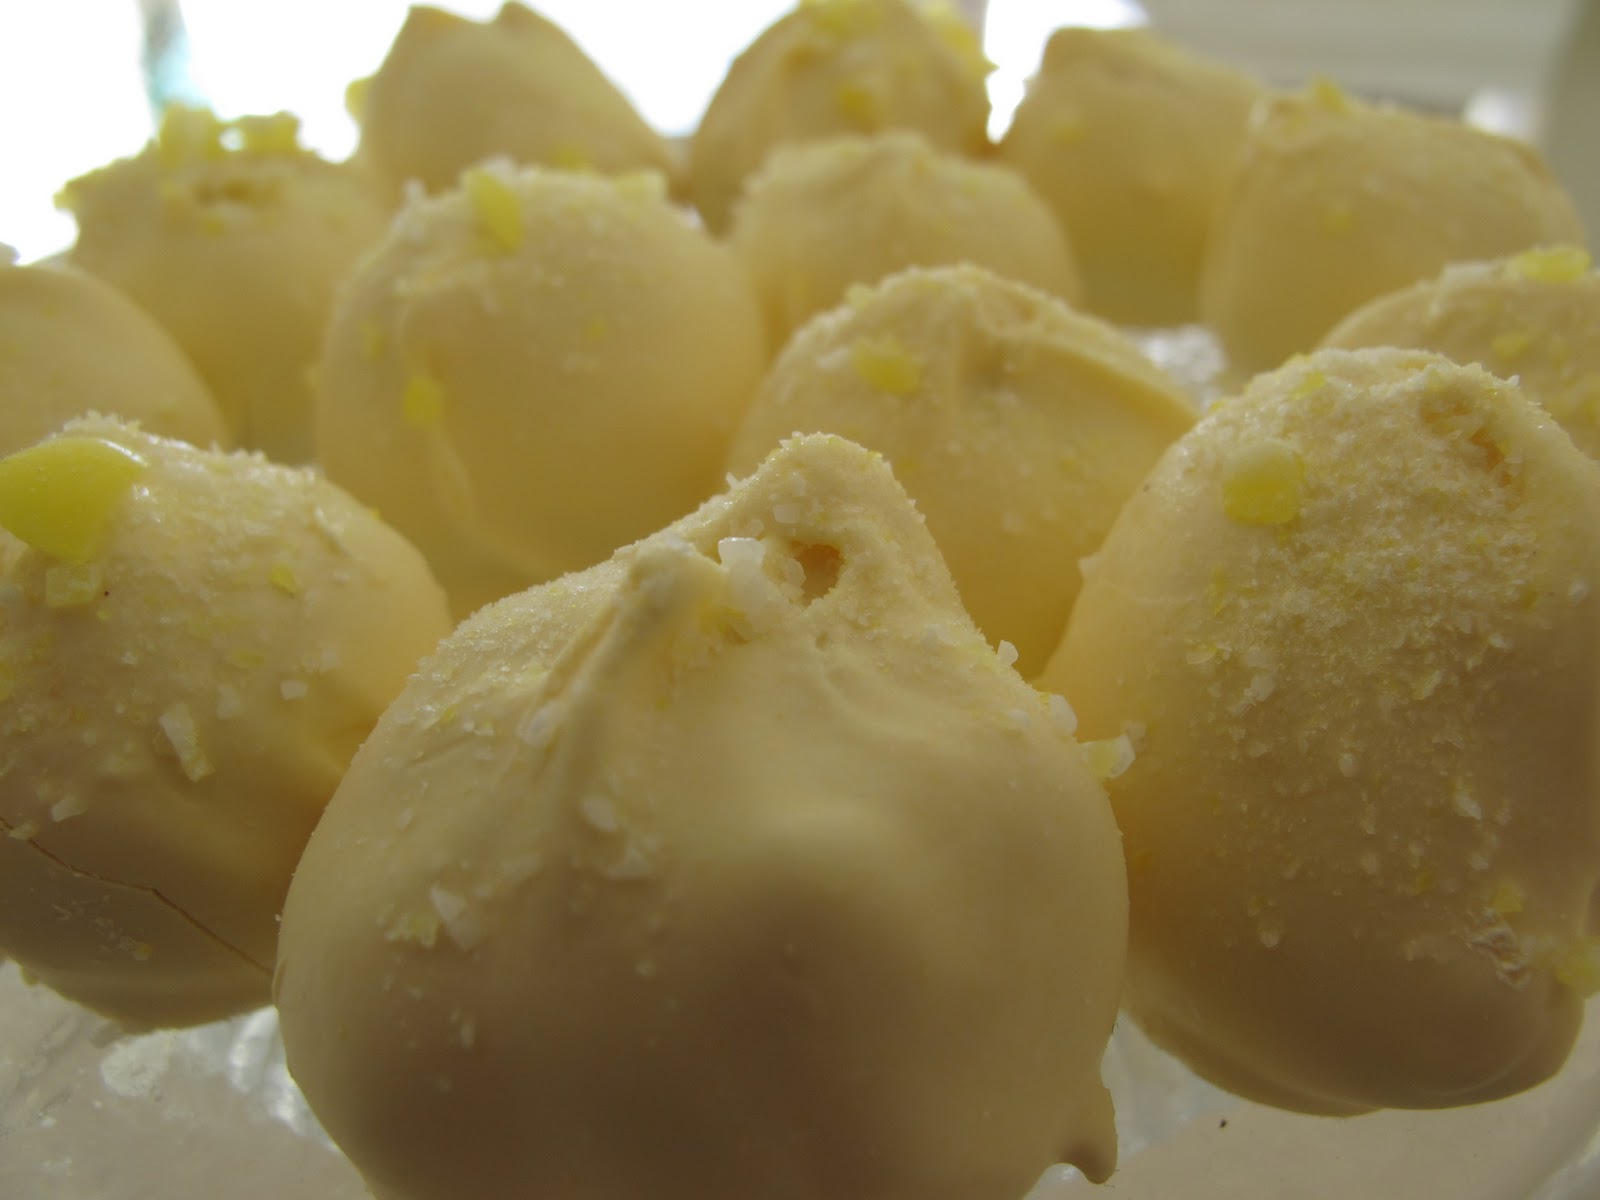 Sugared Lemon Zest